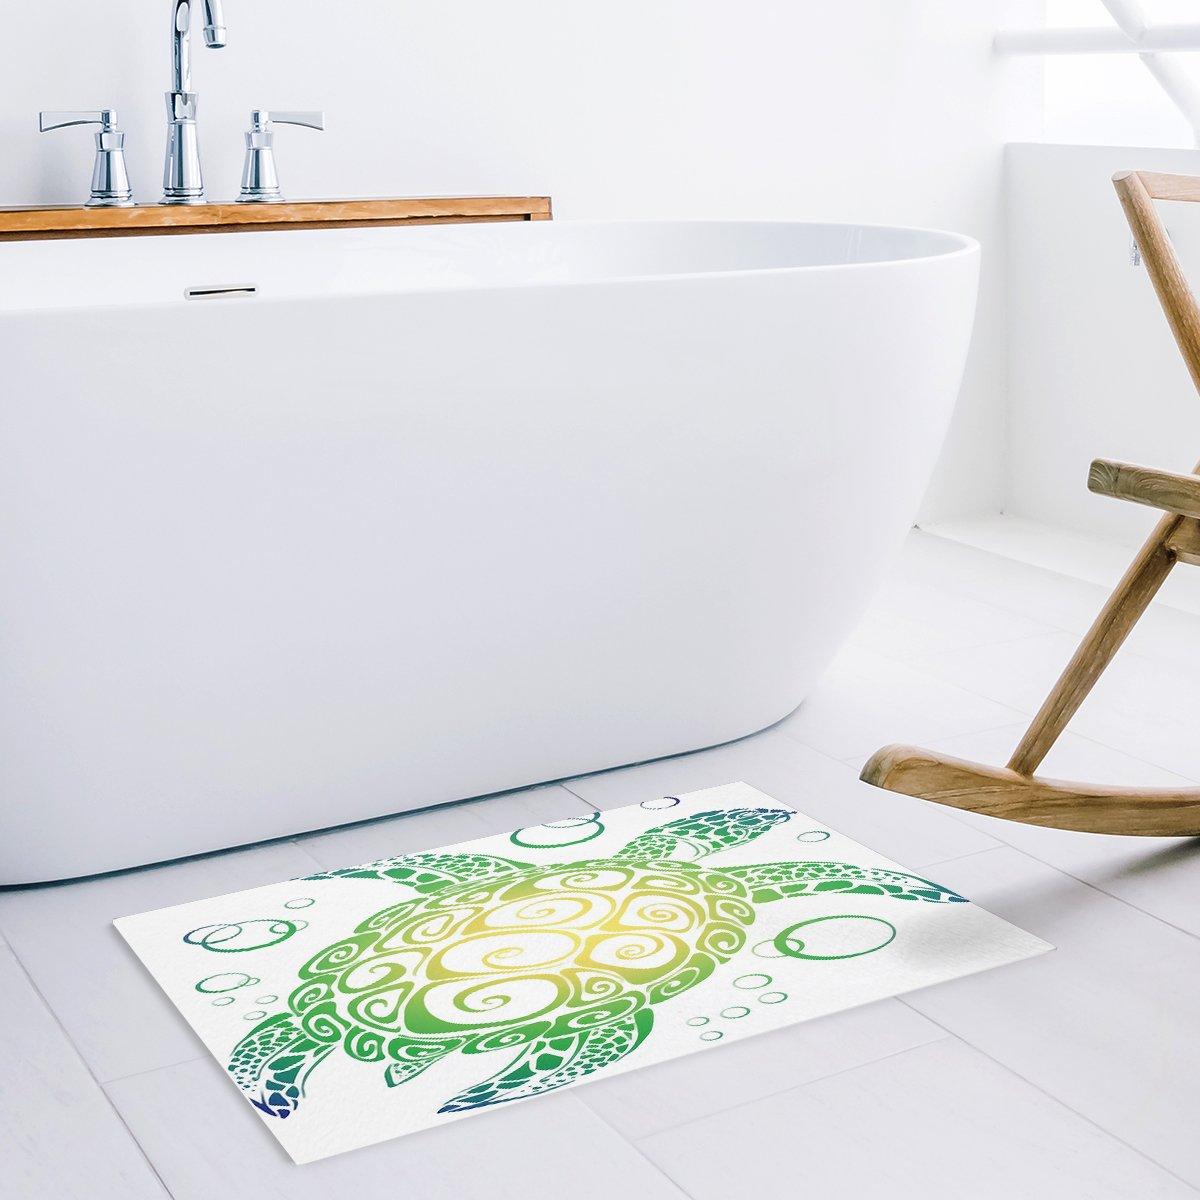 Lovingin Custom Happy Easter Cute Rabbits Design Bath Rugs Soft Bath Mats for Bathroom Machine Washable Doormat 18x30inch